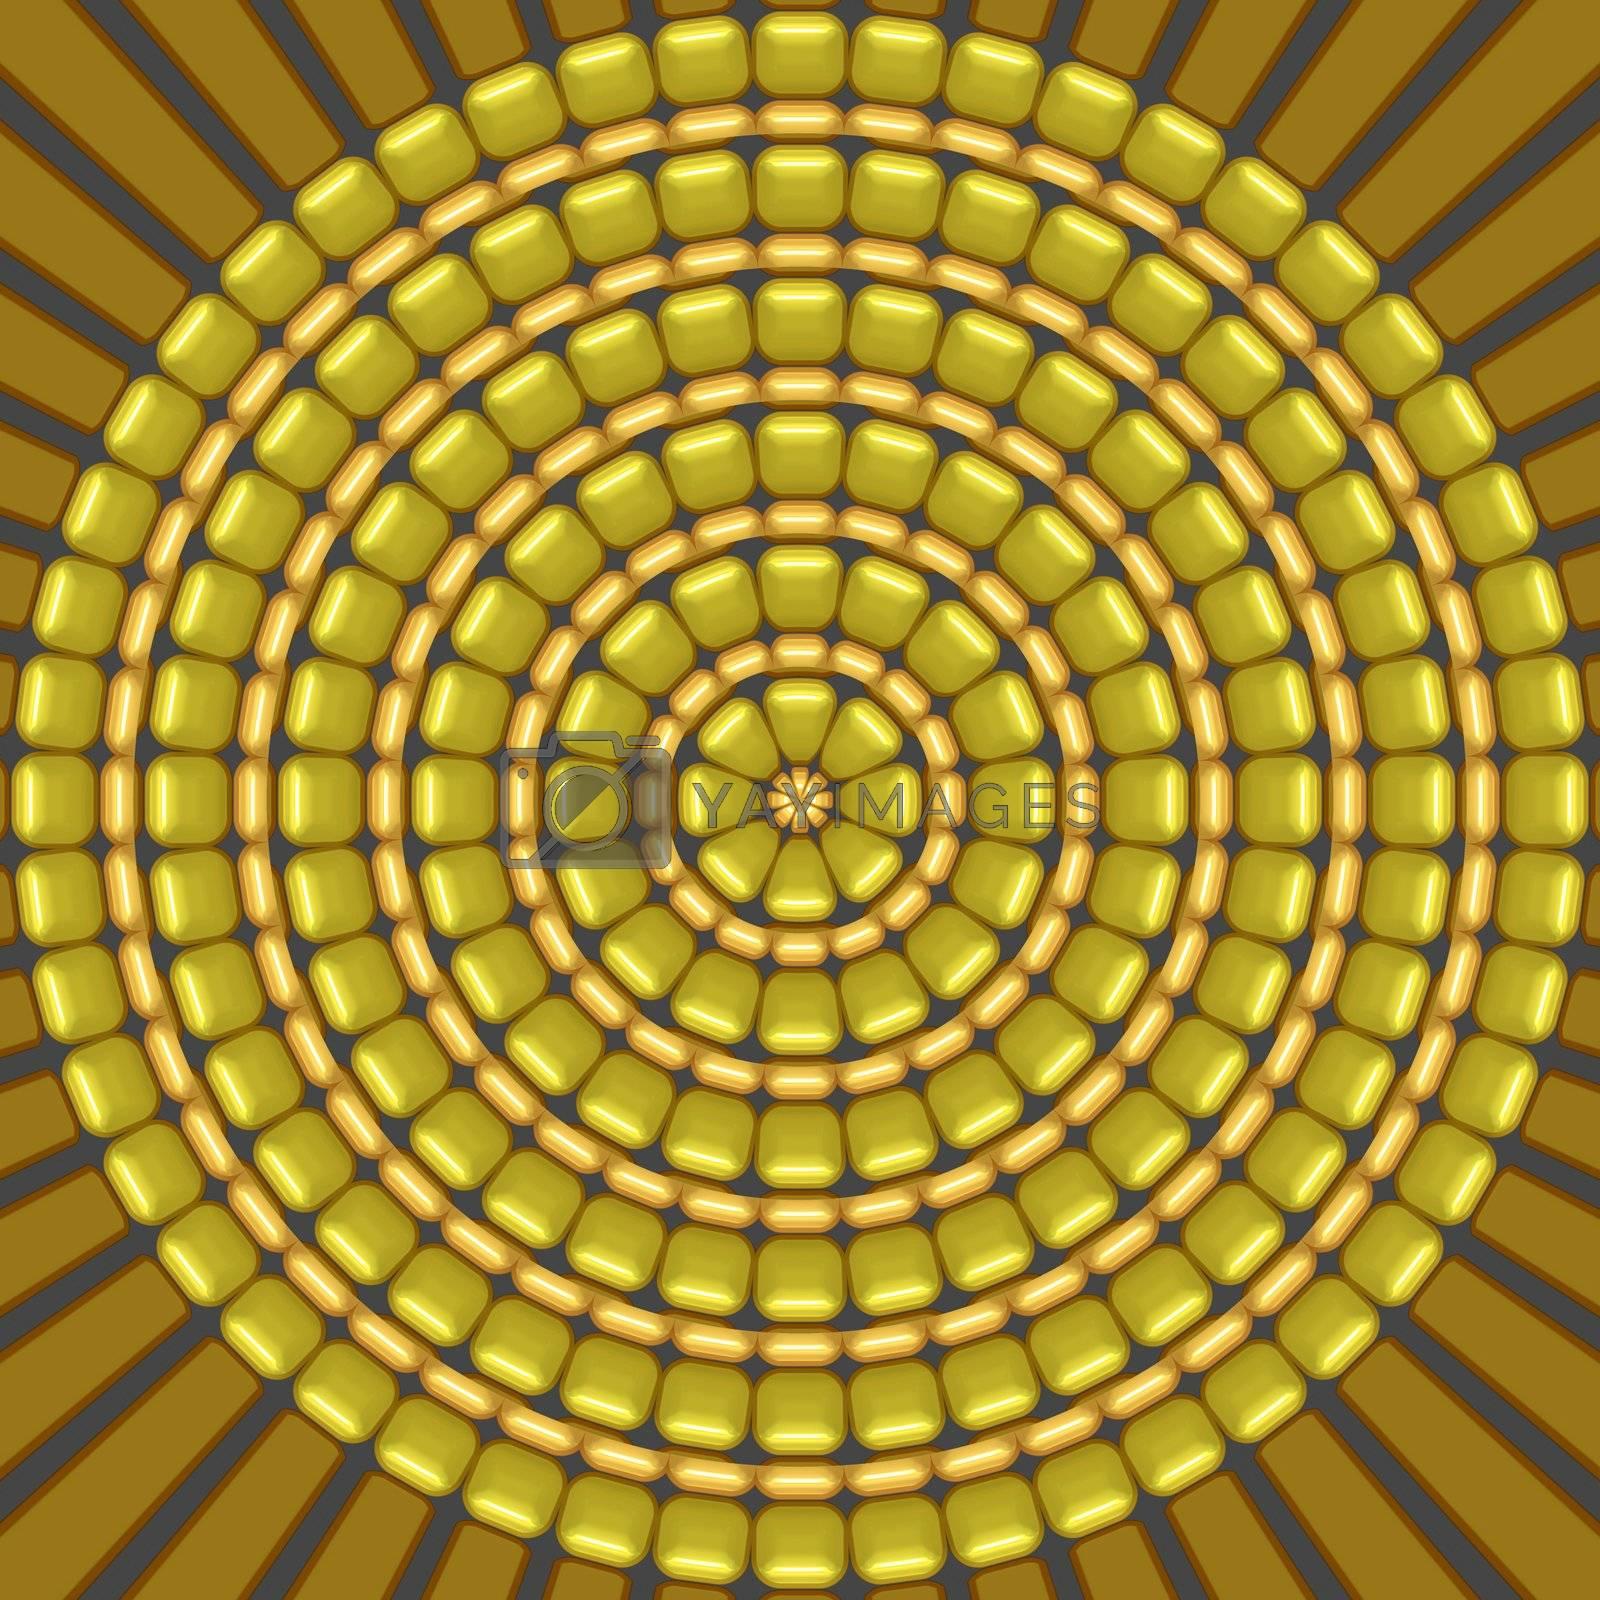 circel shape pattern of yellow corn grains